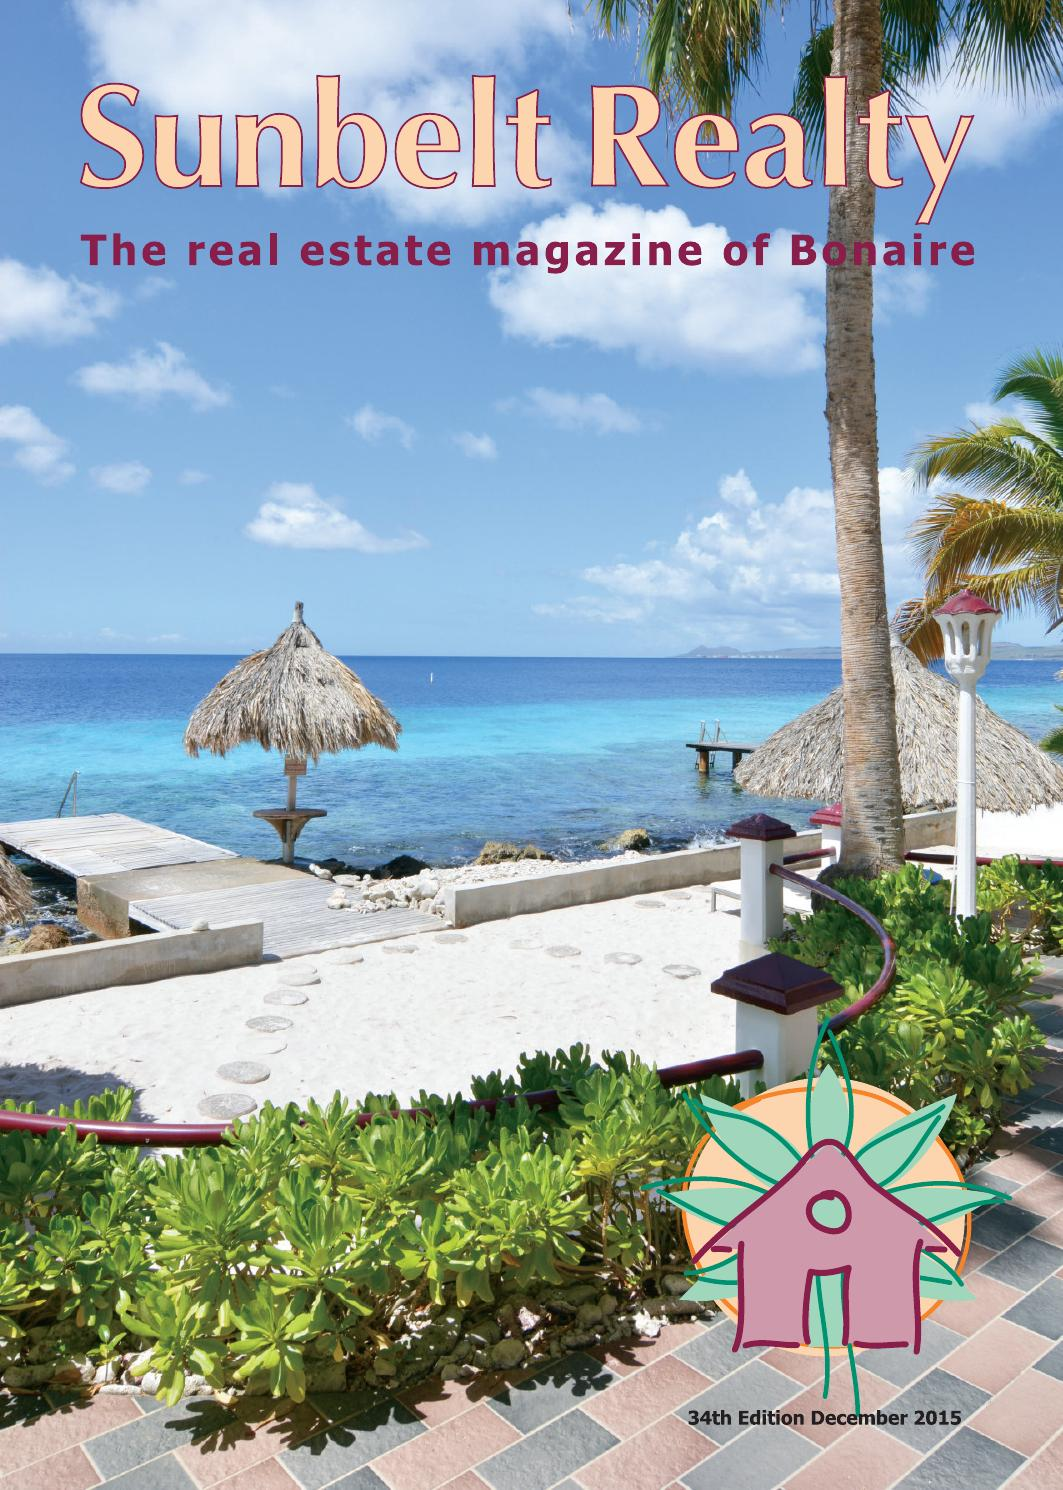 sunbelt realty magazine 34th edition december 2015 by sunbelt